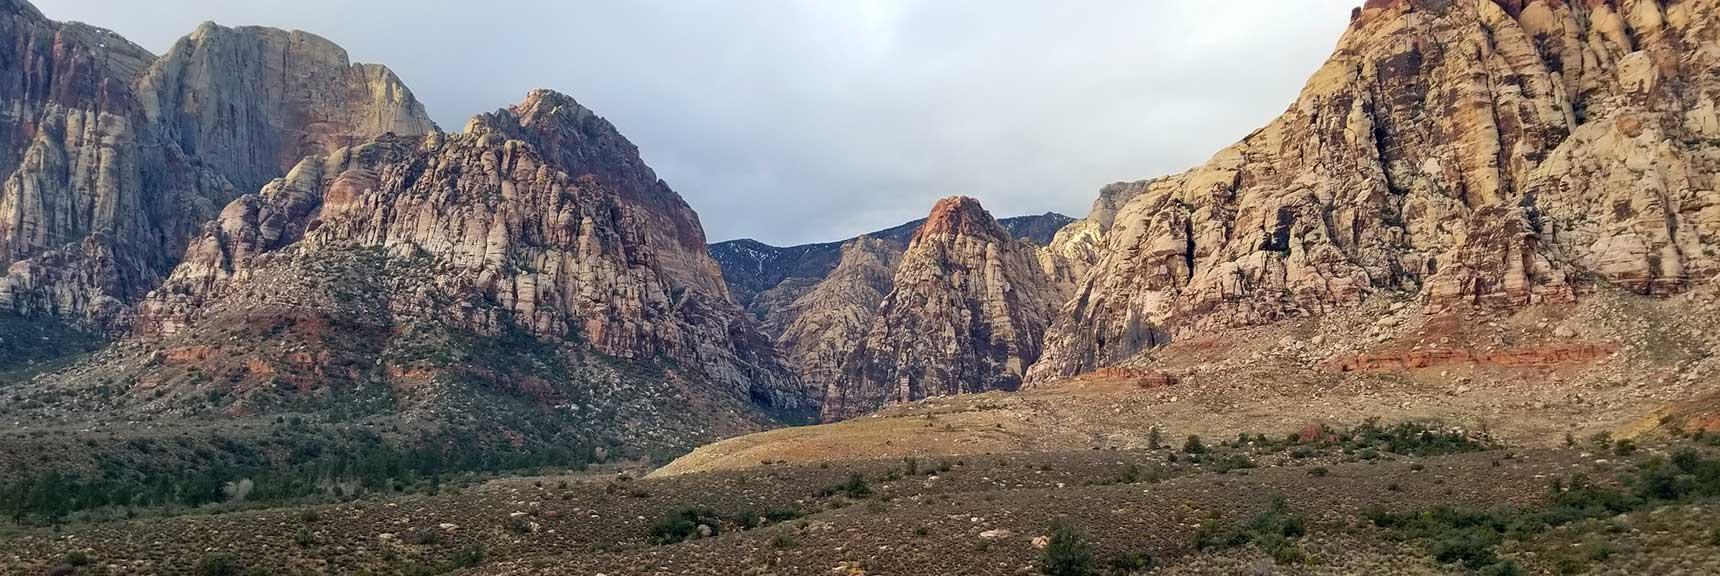 Pine Creek Canyon, Mescalito Peak, Juniper Peak and Rainbow Mountain, Red Rock National Park, Nevada